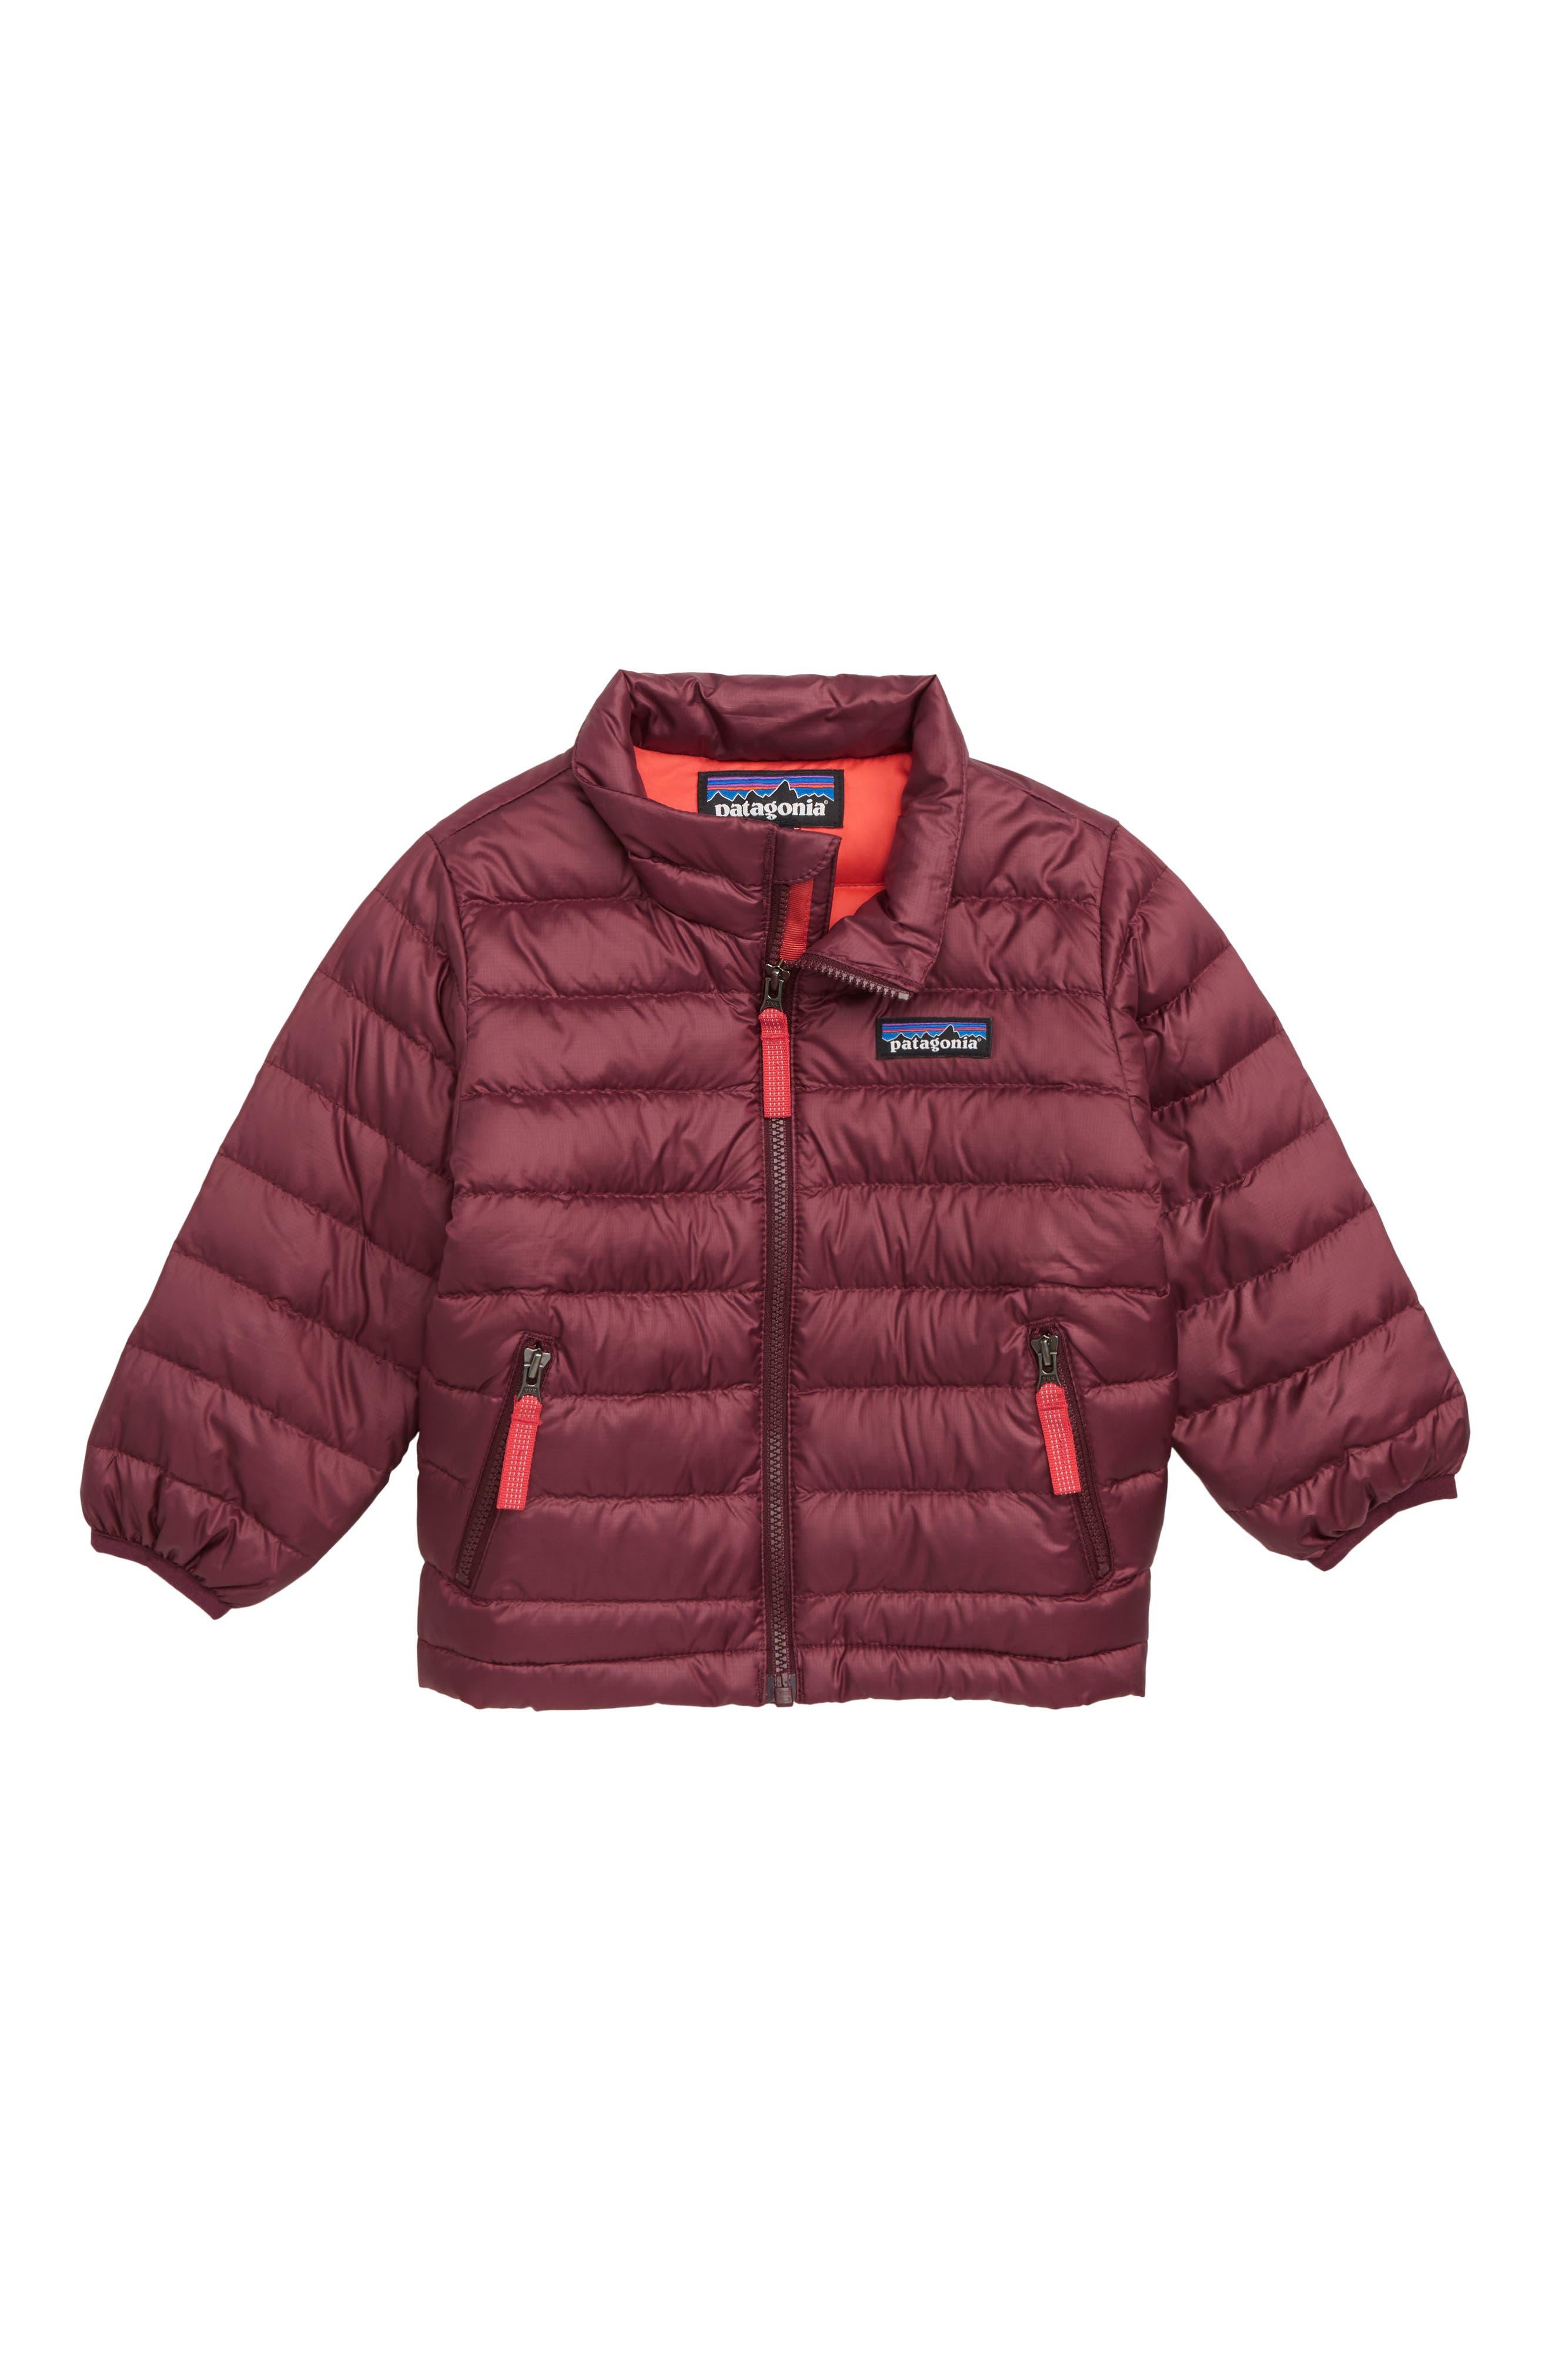 Down Sweater Jacket,                             Main thumbnail 1, color,                             930